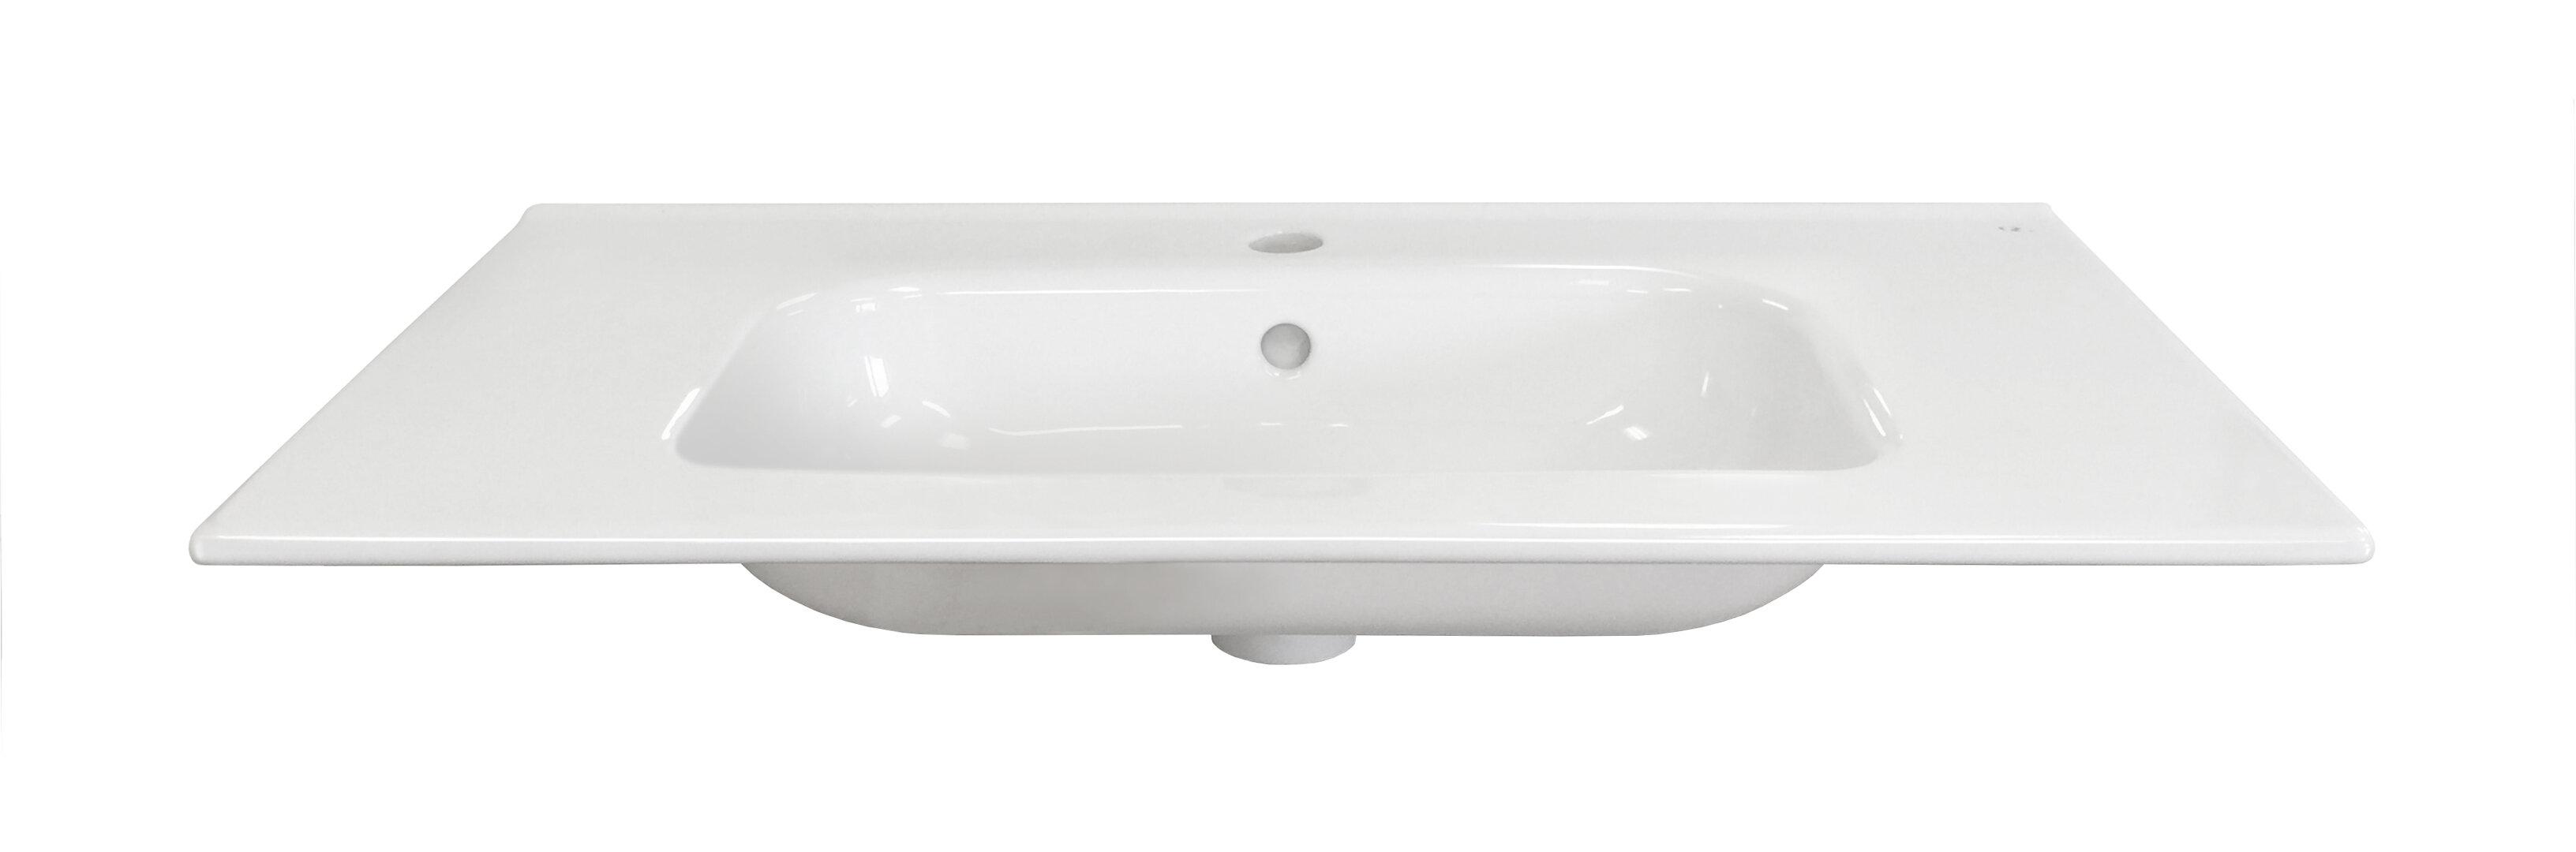 Dawn Usa Ceramic 24 Single Bathroom Sink Top Wayfair